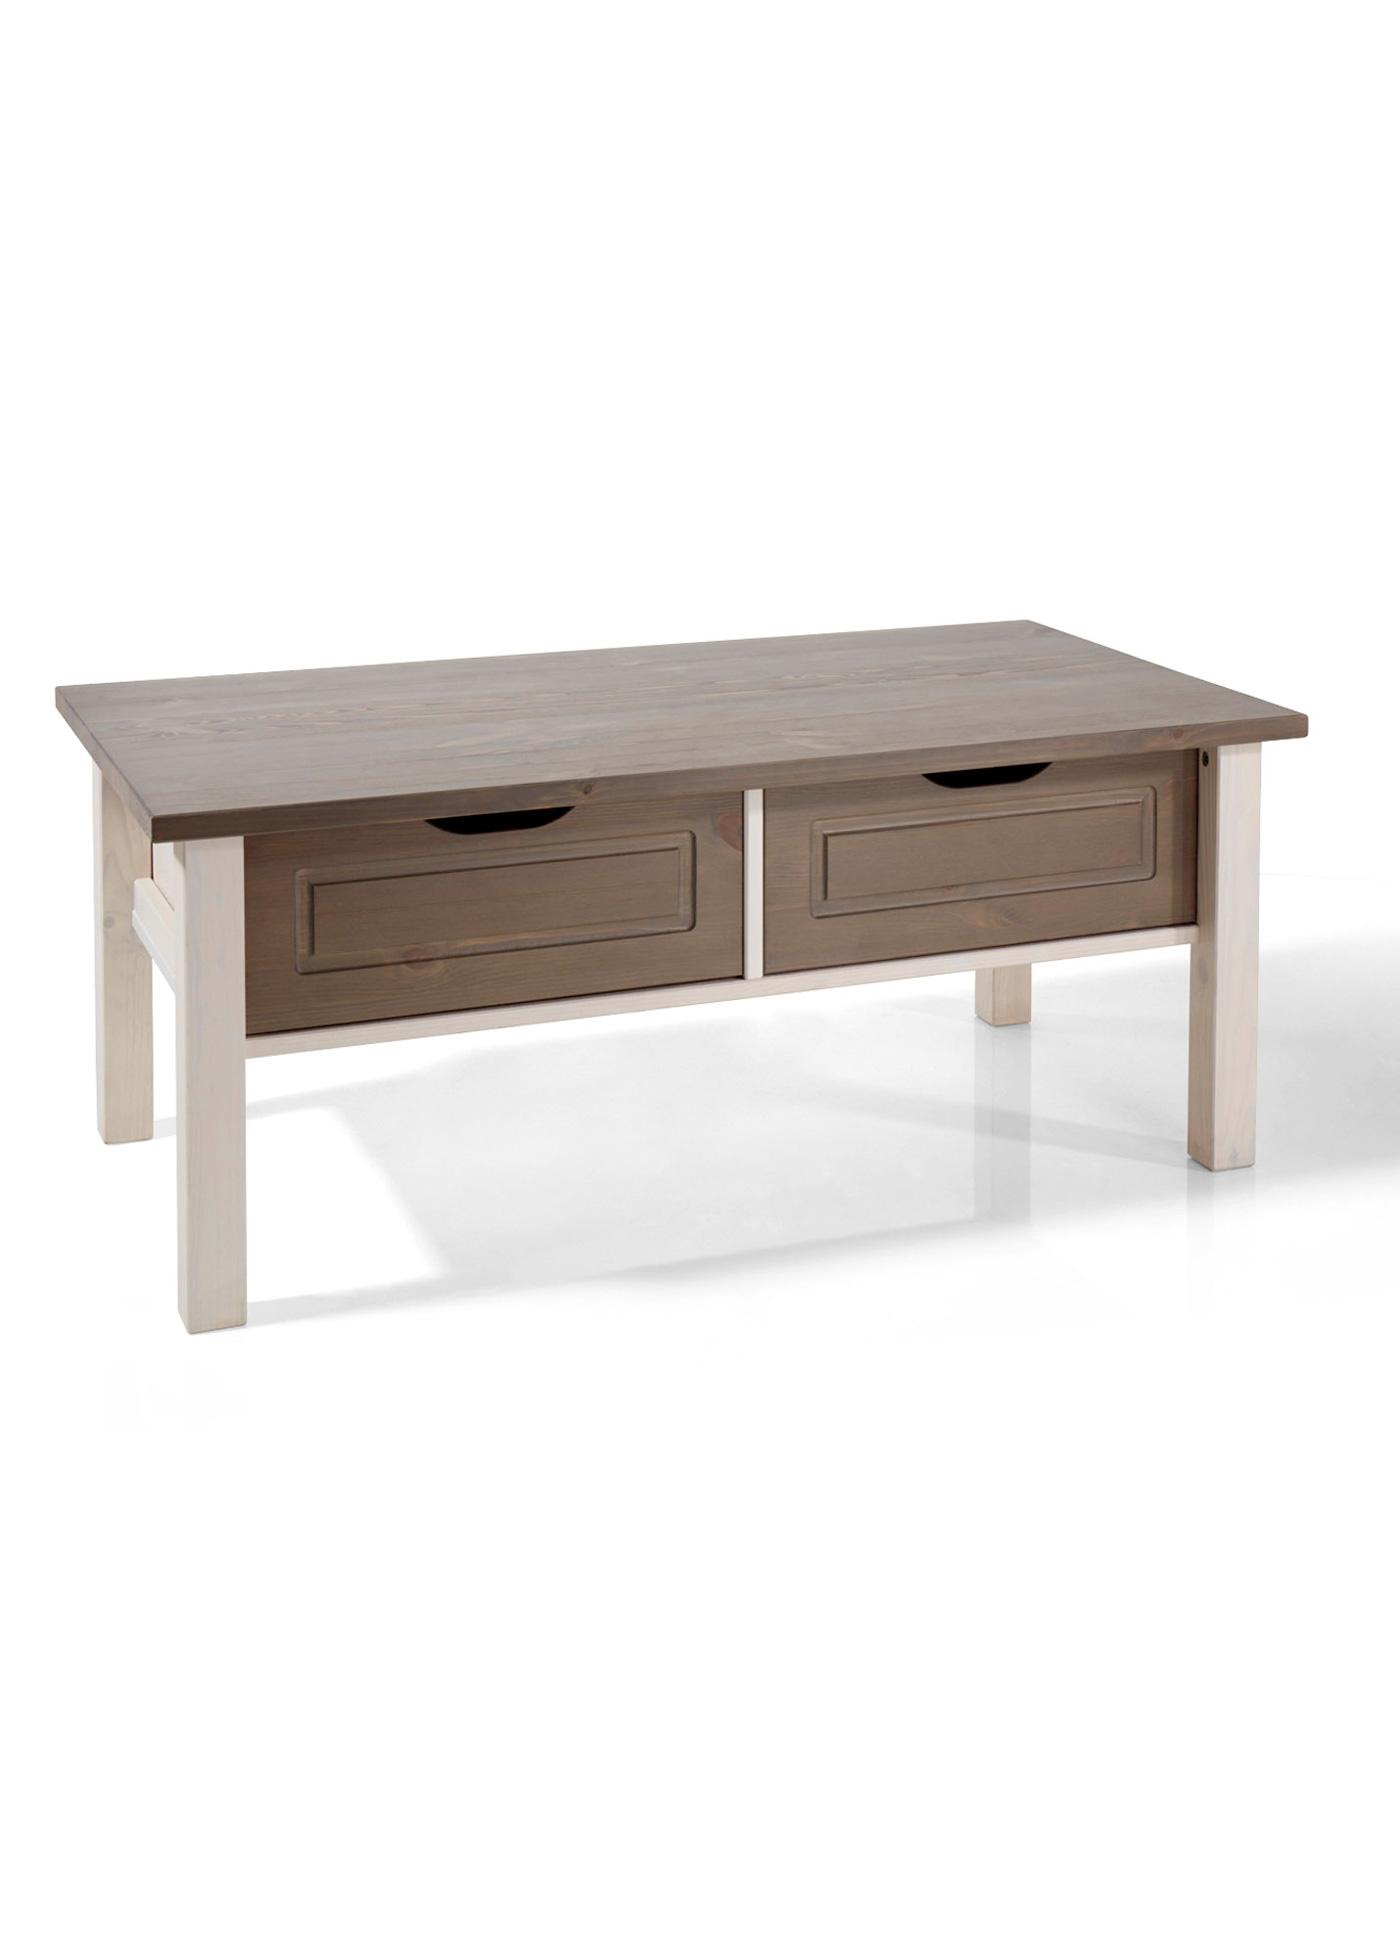 couchtisch wei vintage rechteckig artownit for. Black Bedroom Furniture Sets. Home Design Ideas